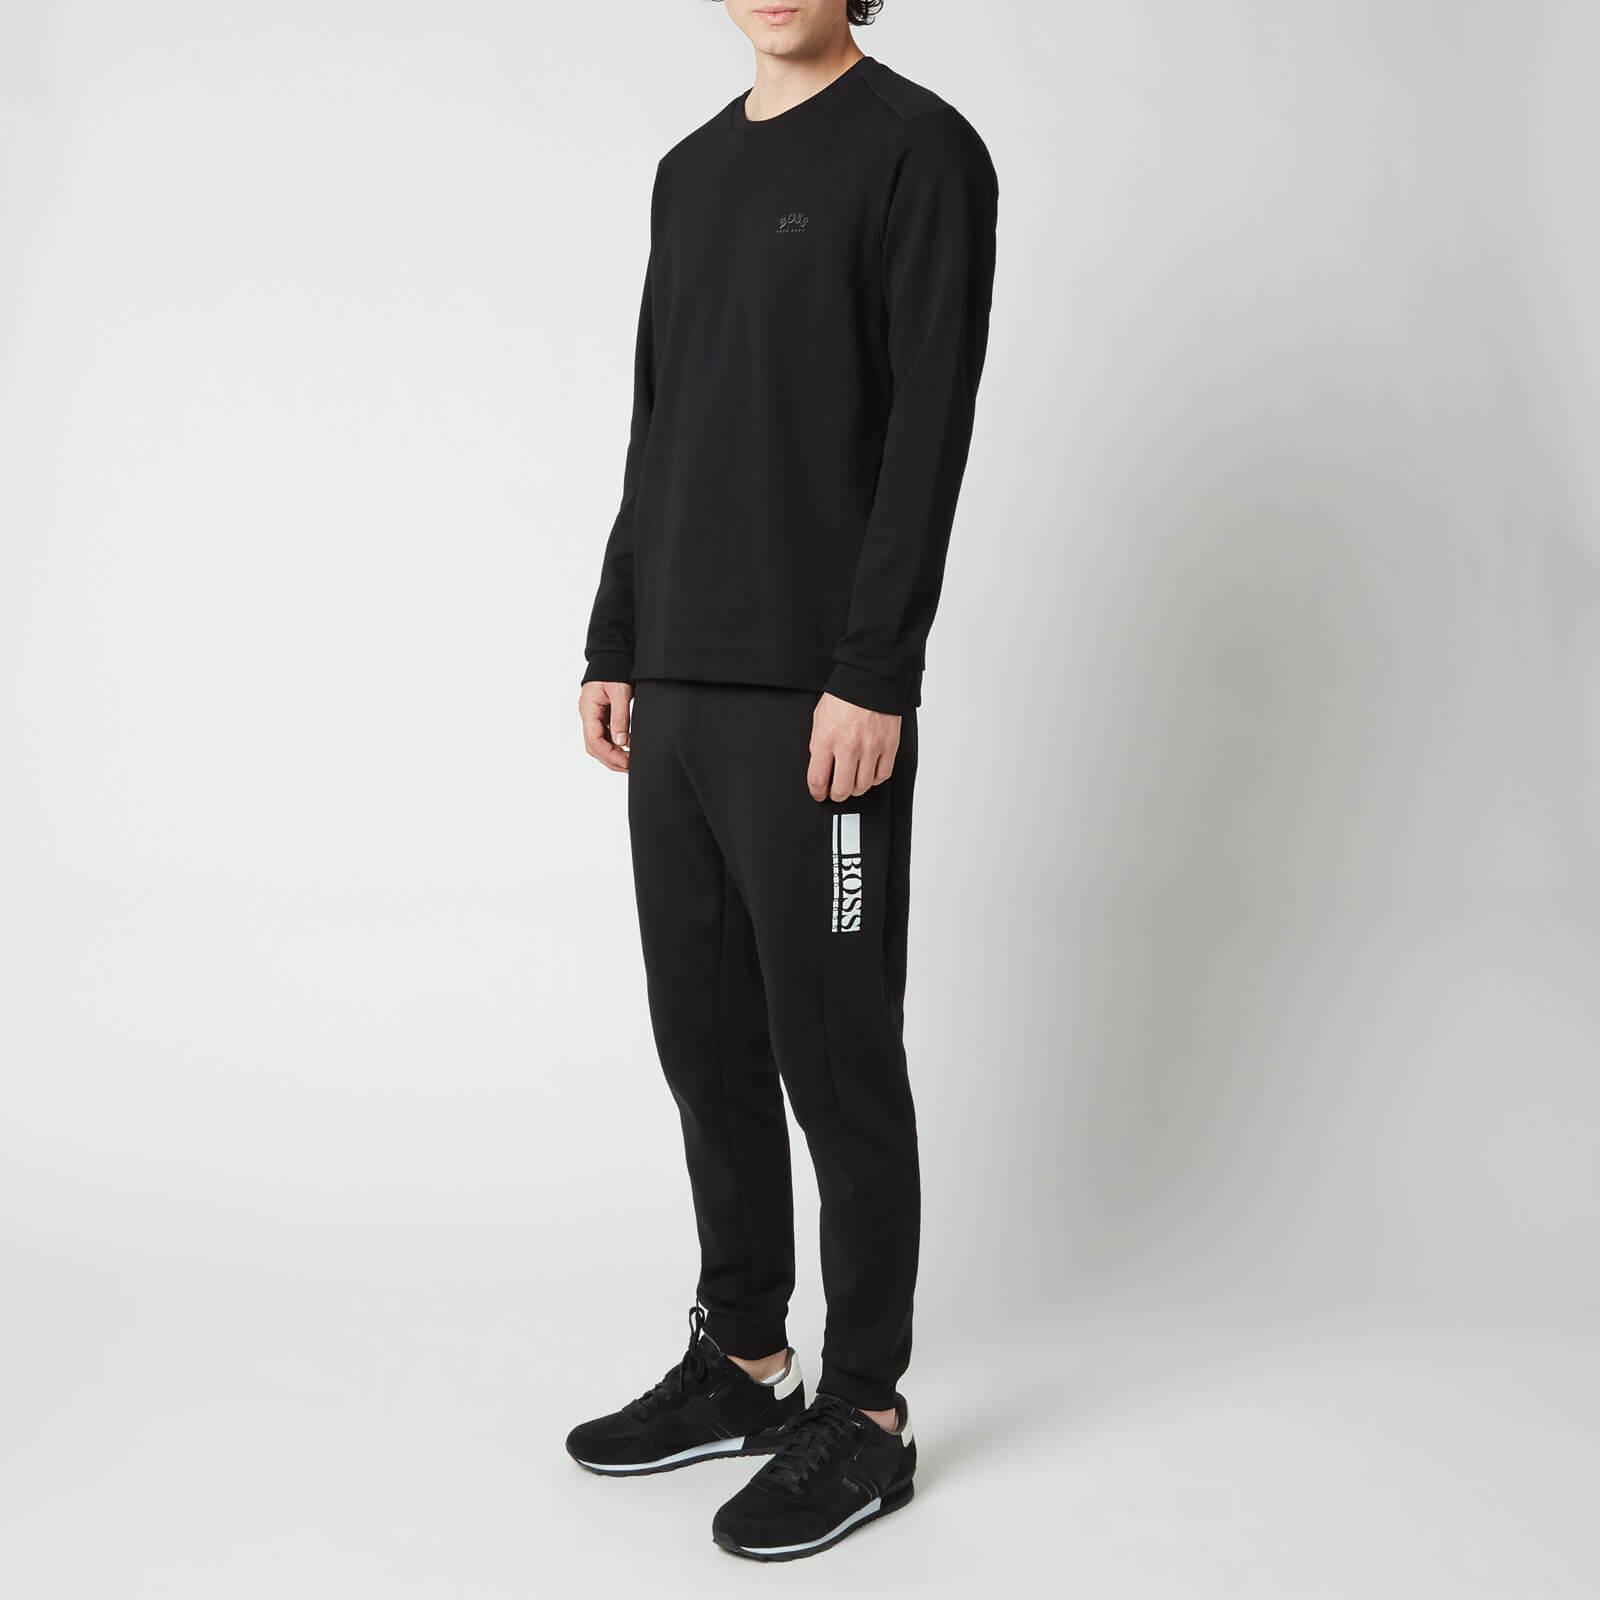 Boss Athleisure Men's Salbo Sweatshirt - Black - Xl 50455074 001 Mens Tops, Black